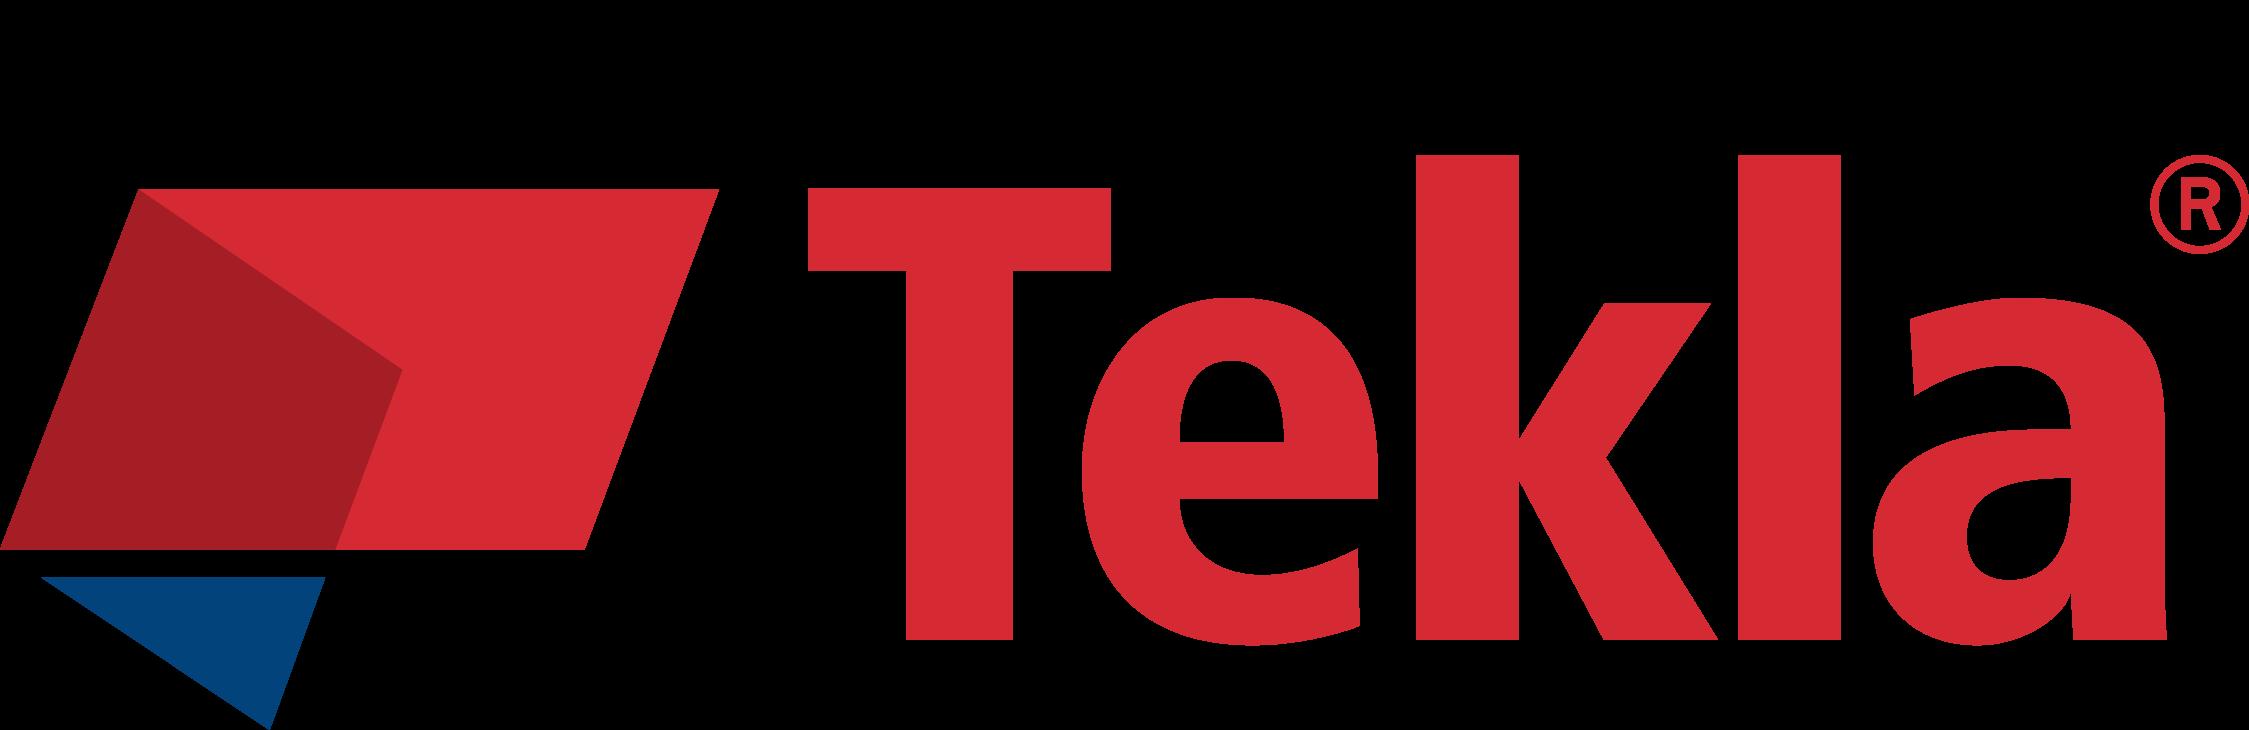 TrimbleLogo-Tekla2016-pos-RGB